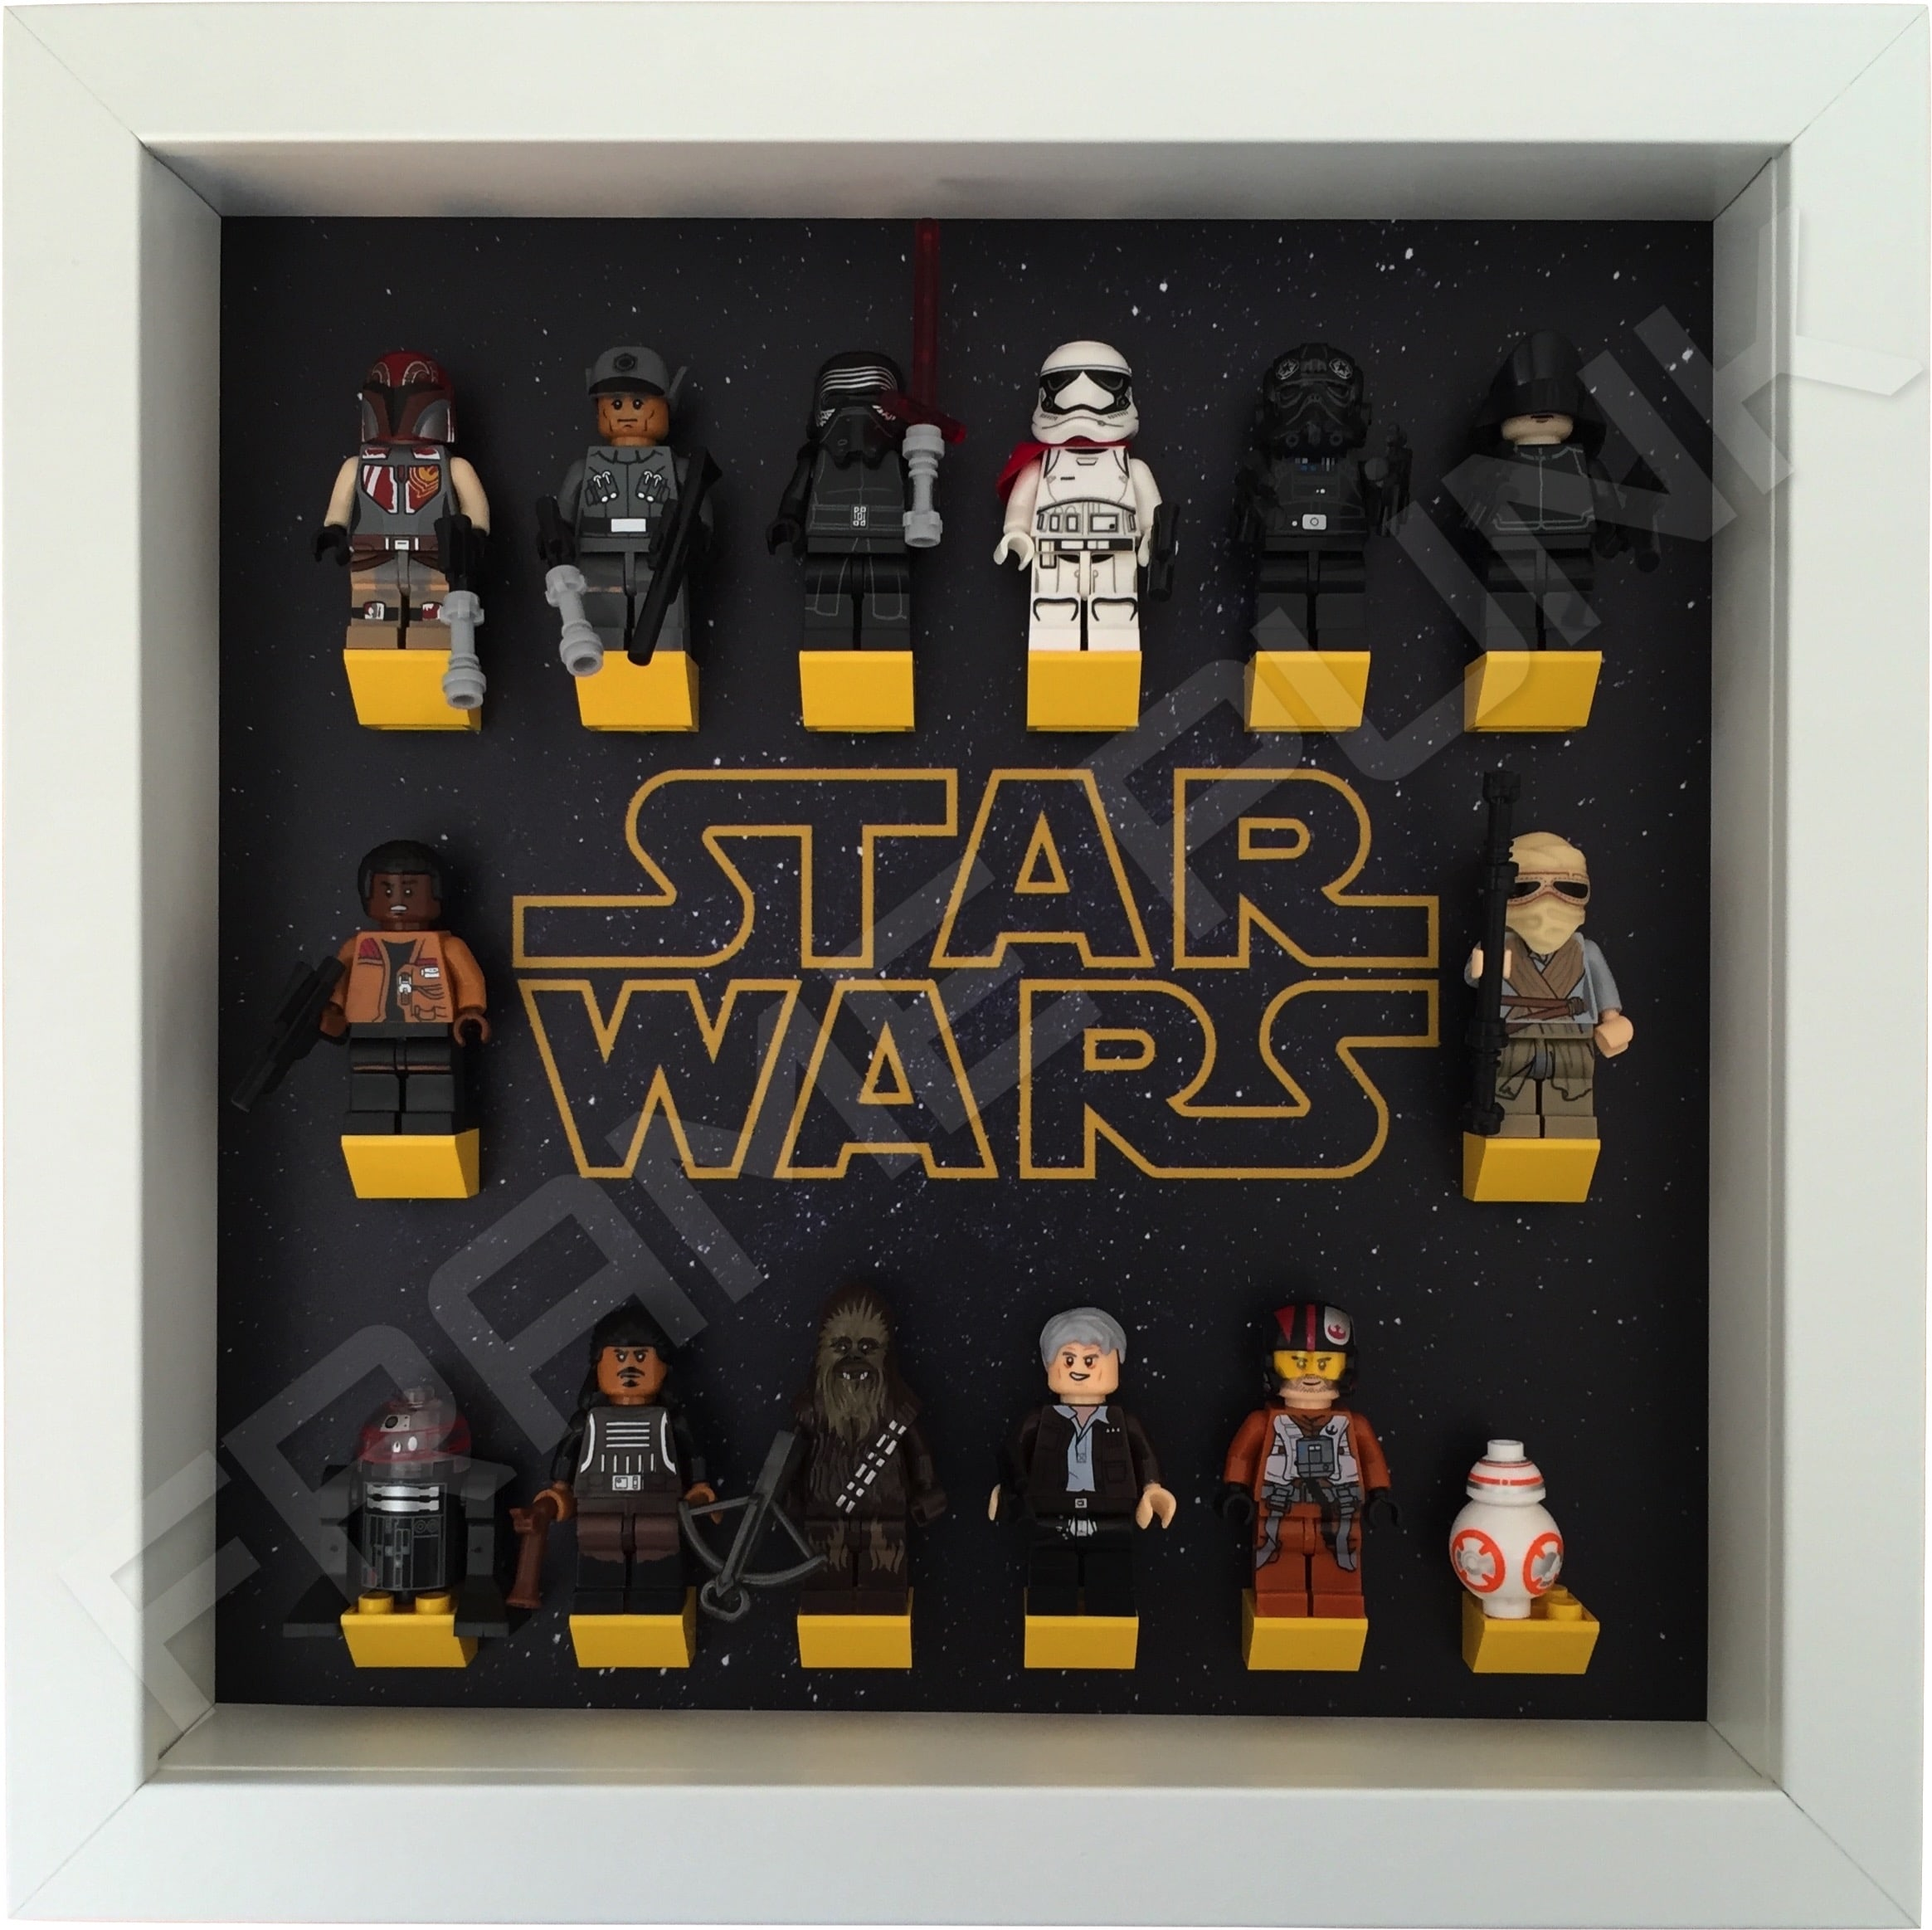 Star Wars Lego Minifigure White Display Frame Frame Punk